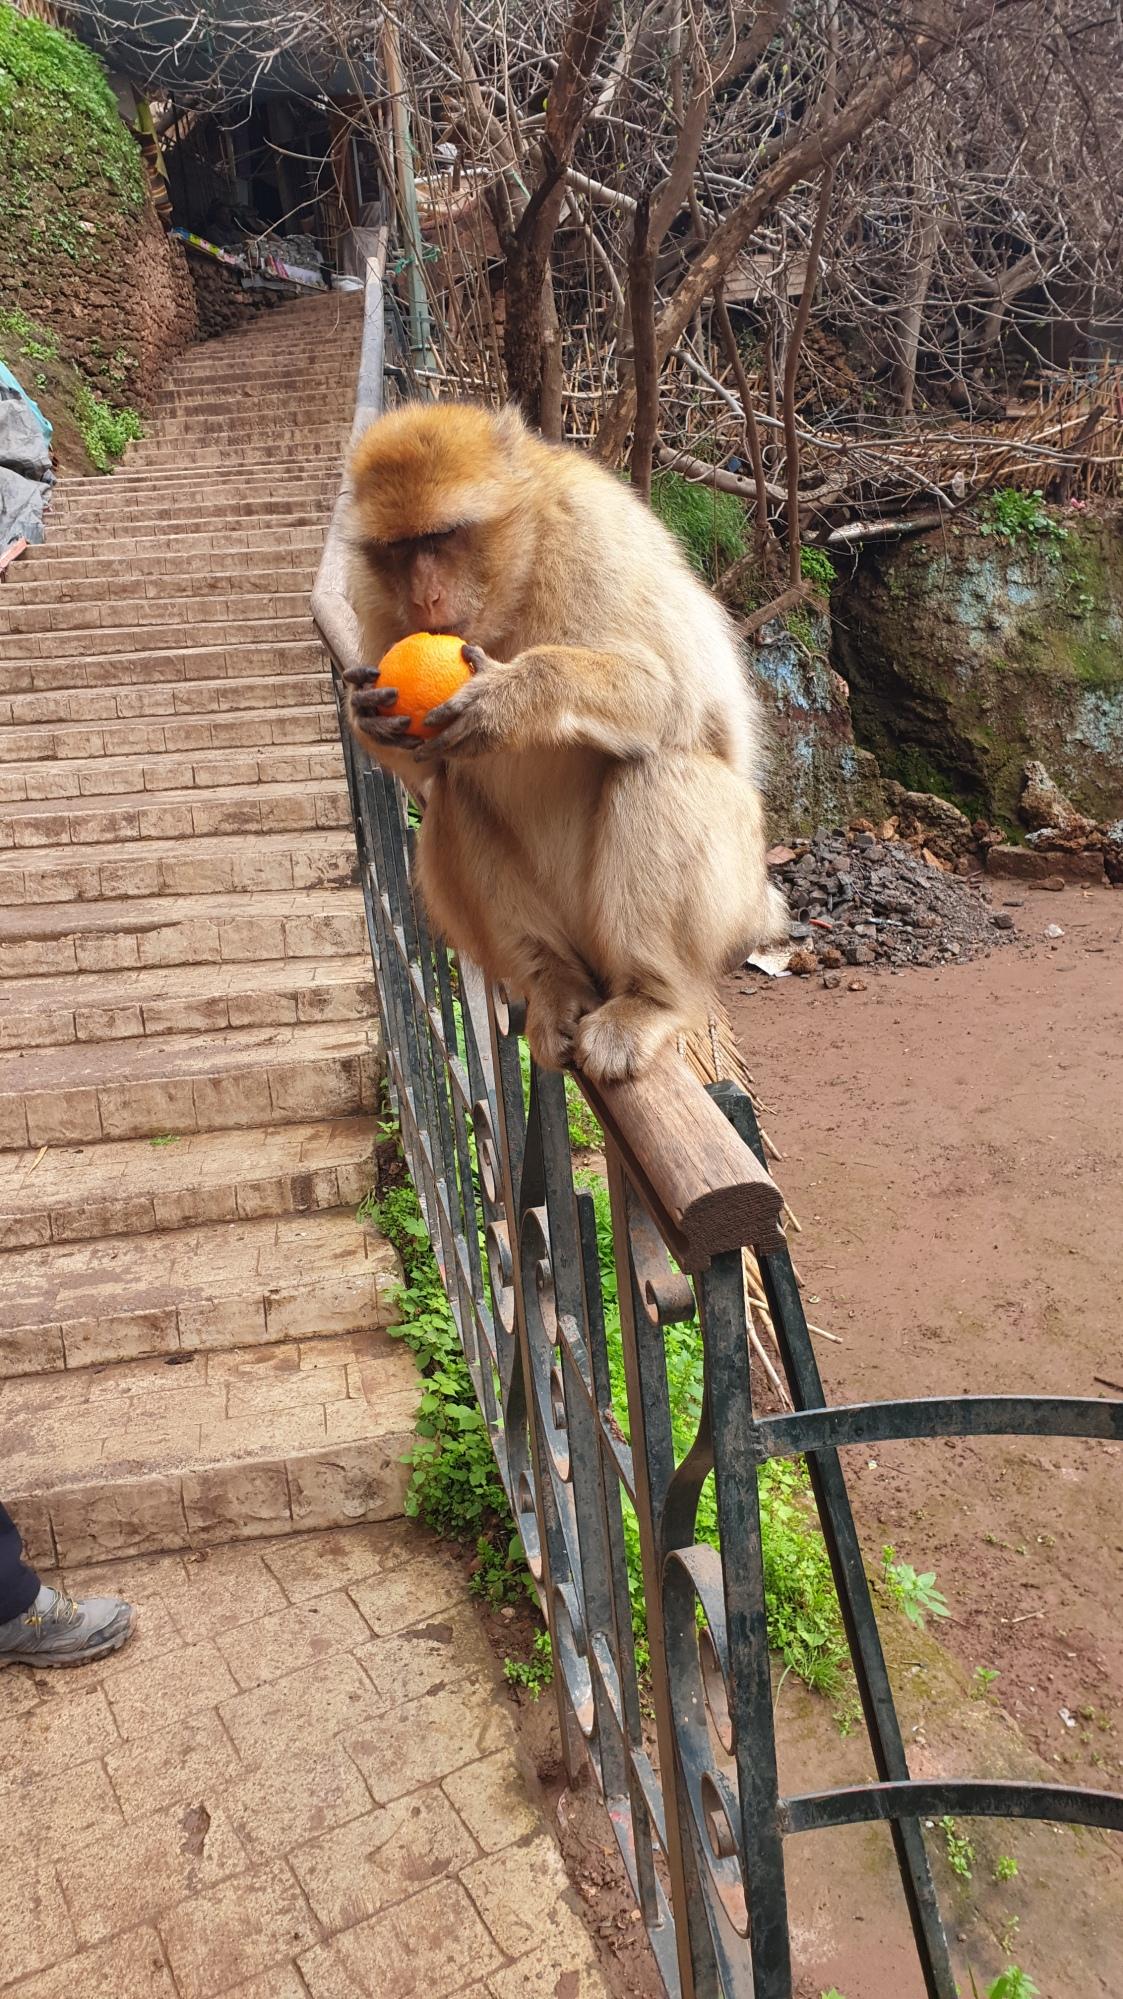 Un singe magot mangeant une orange